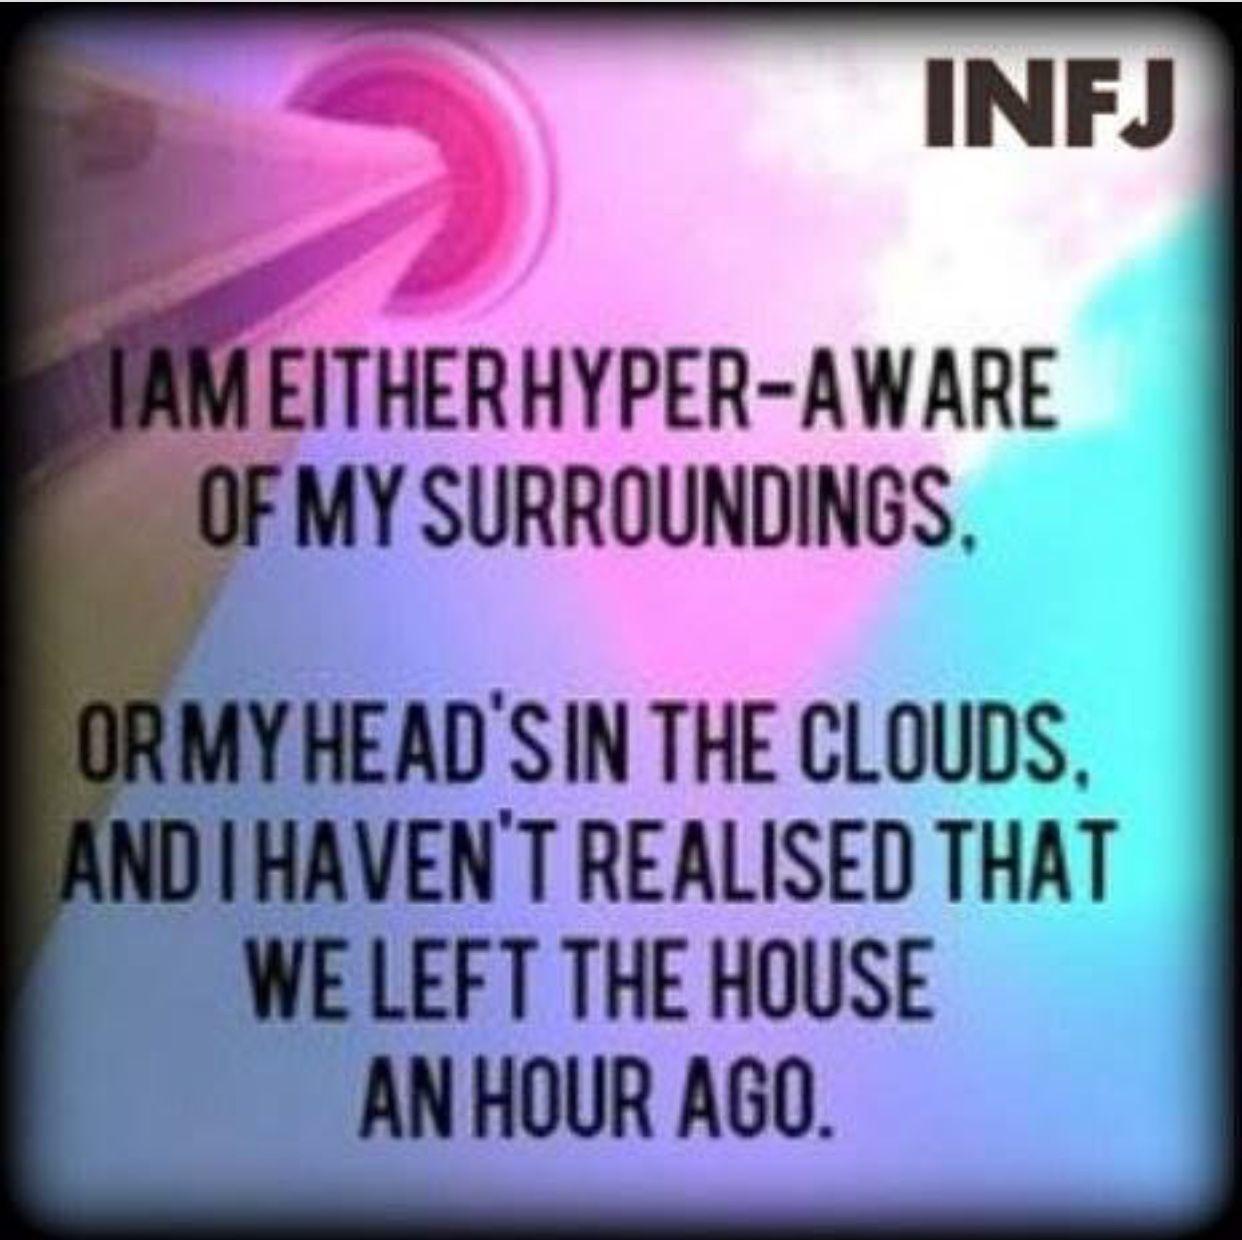 Pin by Umaya Ys on INFJ's (MBTI Personality Type) | Infj